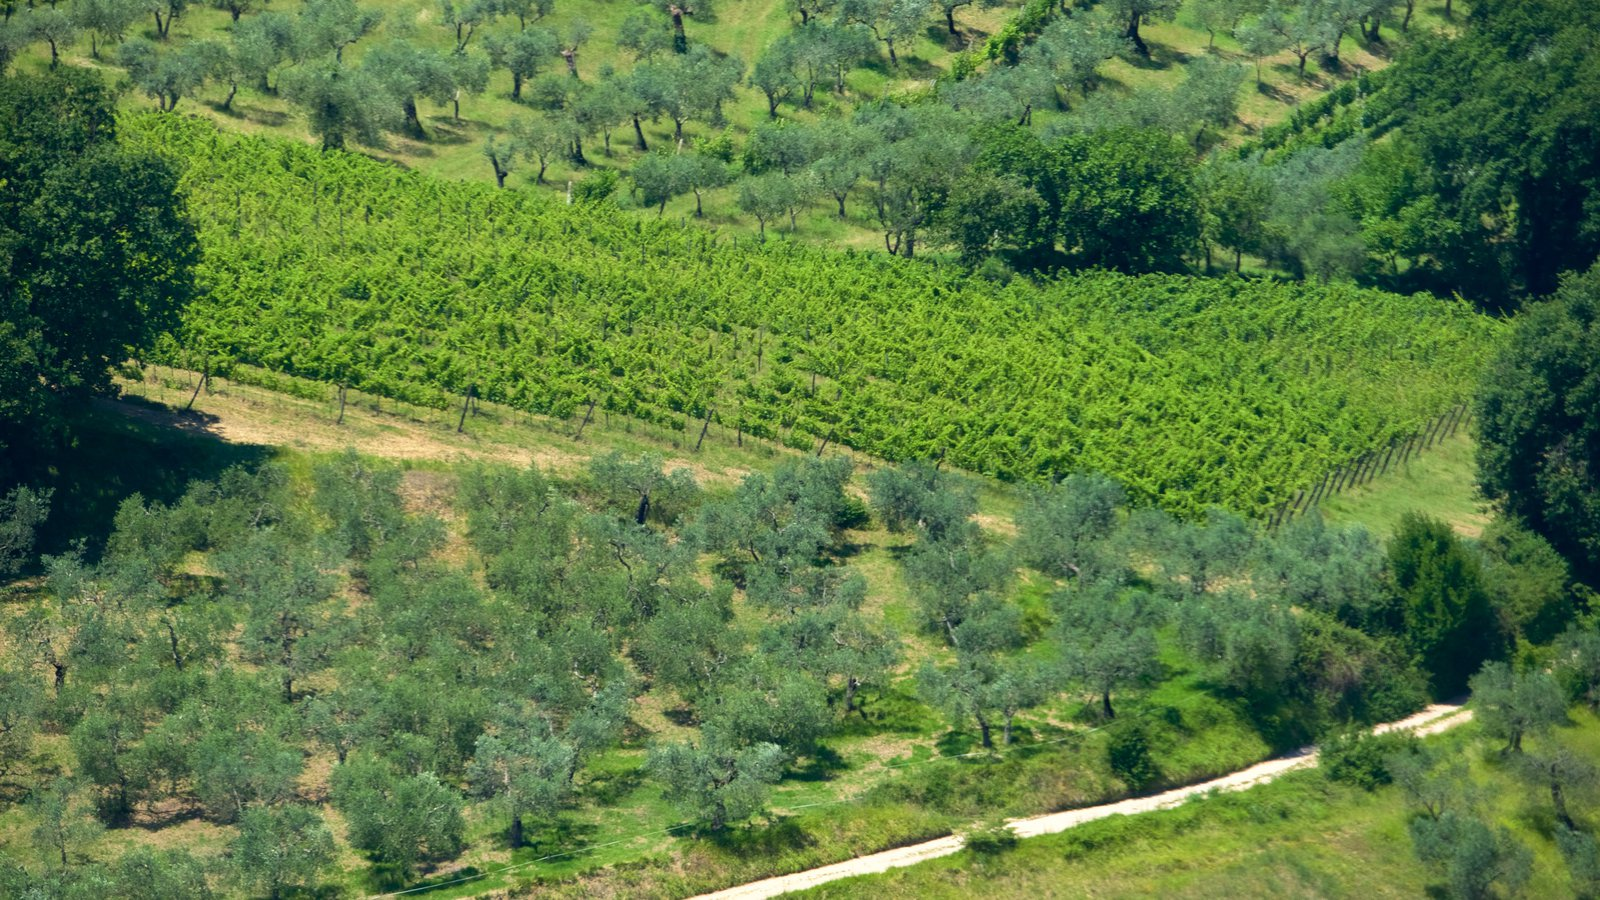 Montefalco showing farmland